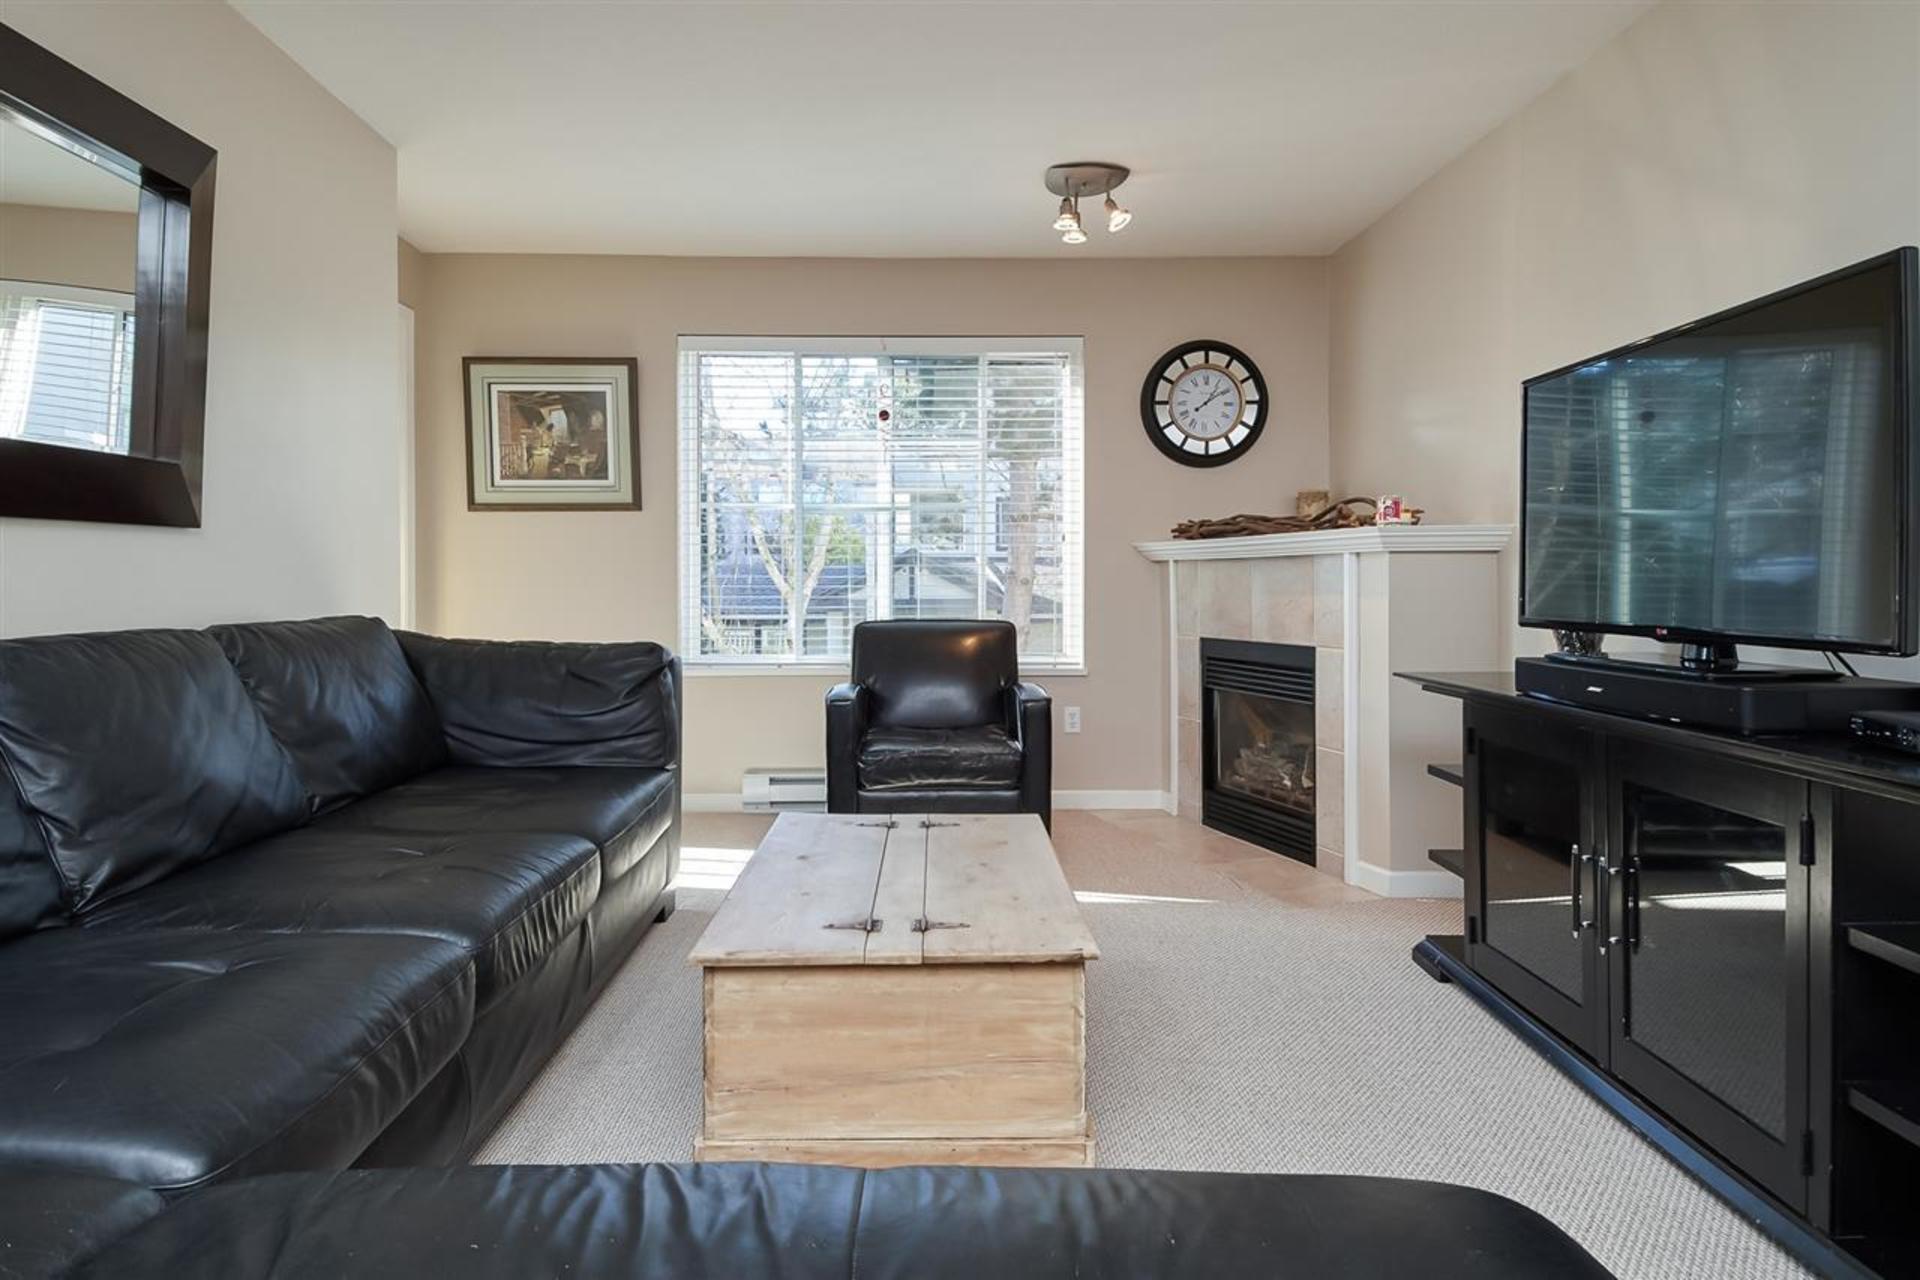 15298-20-avenue-king-george-corridor-south-surrey-white-rock-08 at 207 - 15298 20 Avenue, King George Corridor, South Surrey White Rock